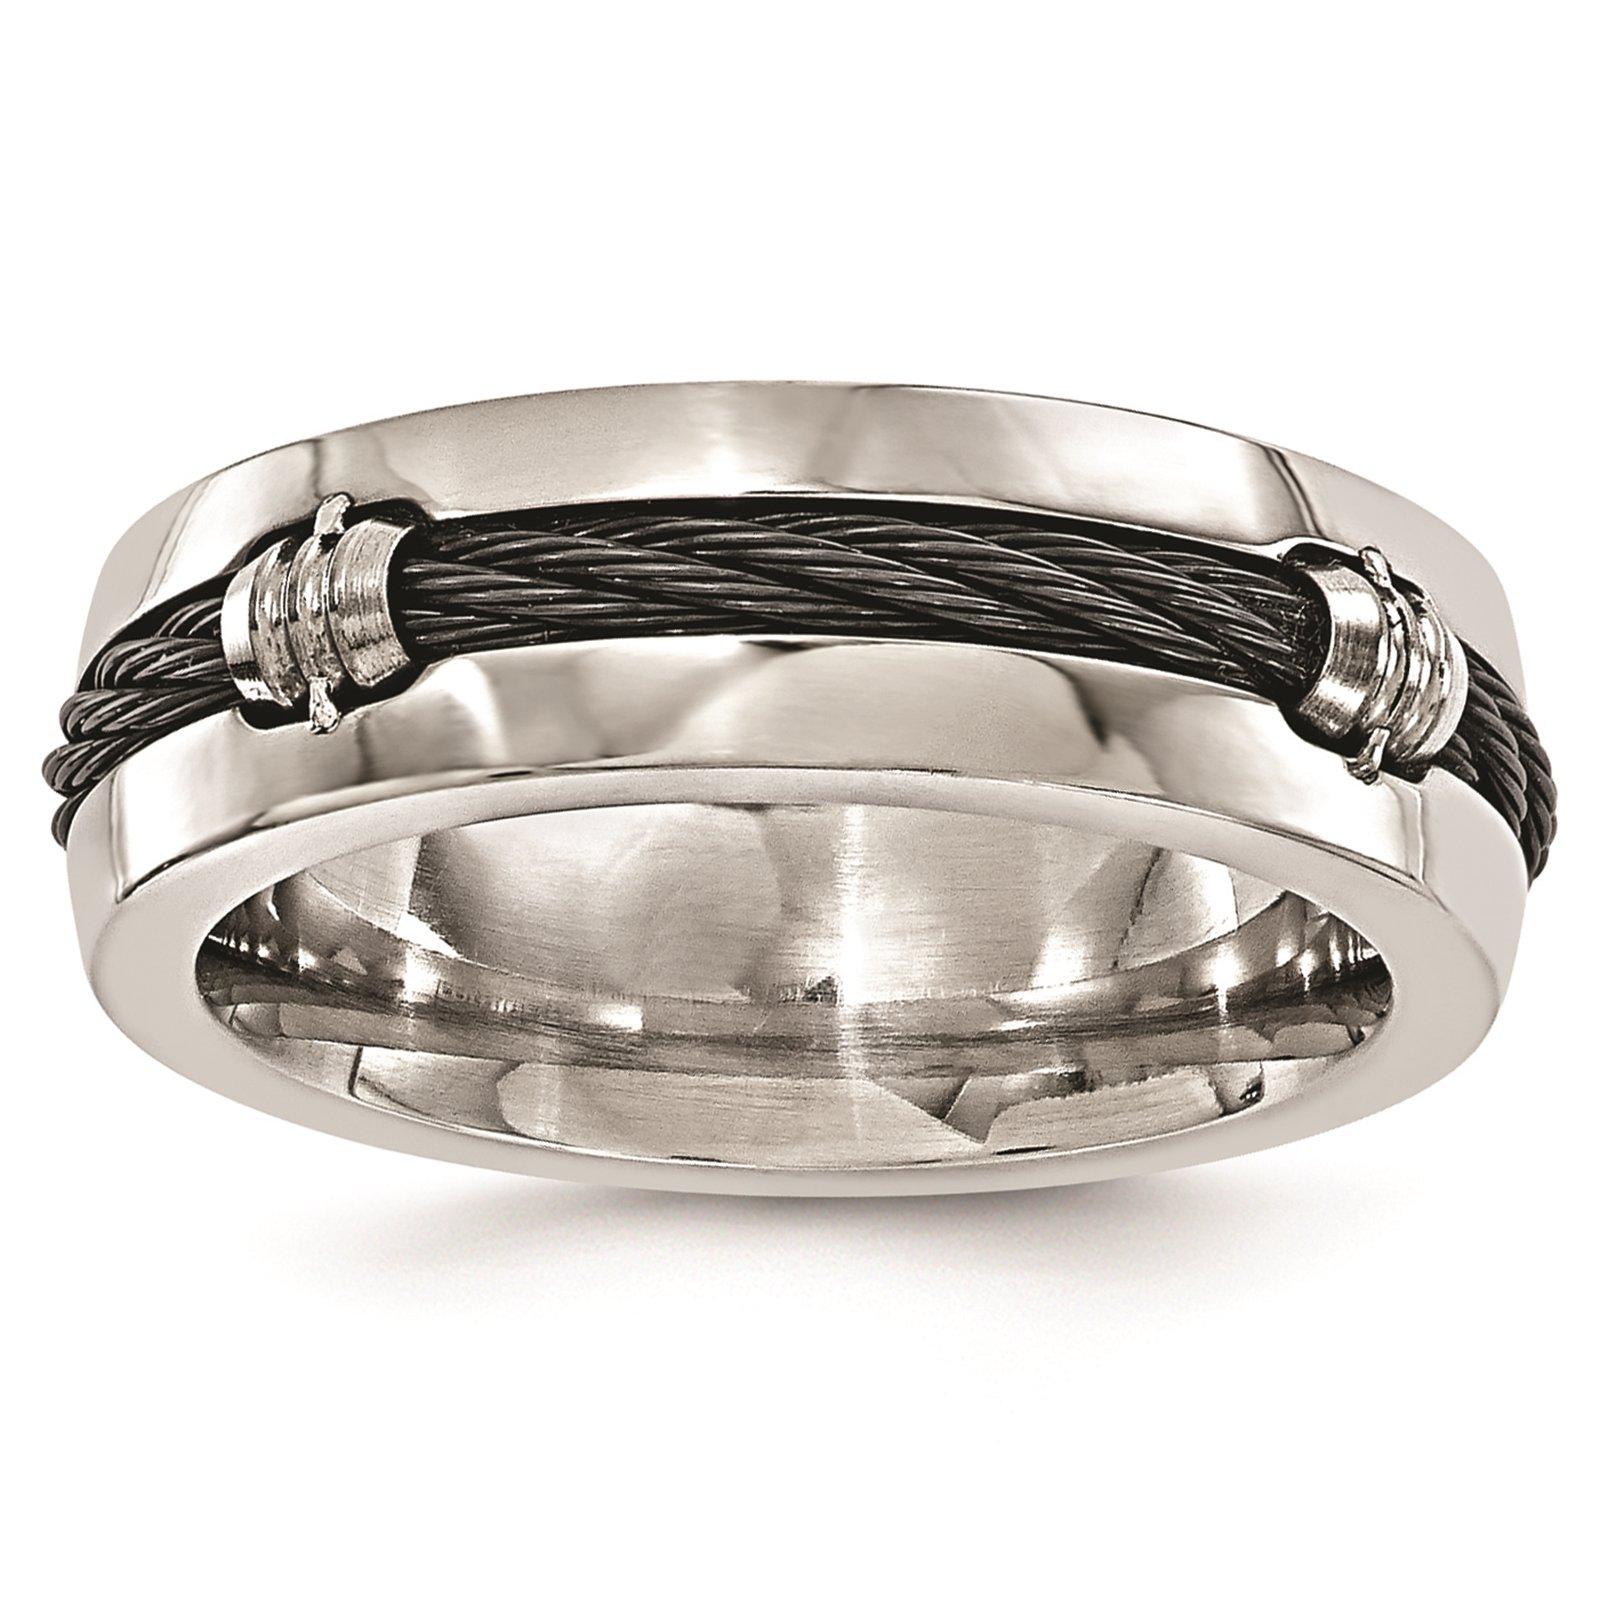 Titanium & Cable Polished 7mm Wedding Ring Band Size 8 by Edward Mirell by Venture Edward Mirell Titanium Bands (Image #1)